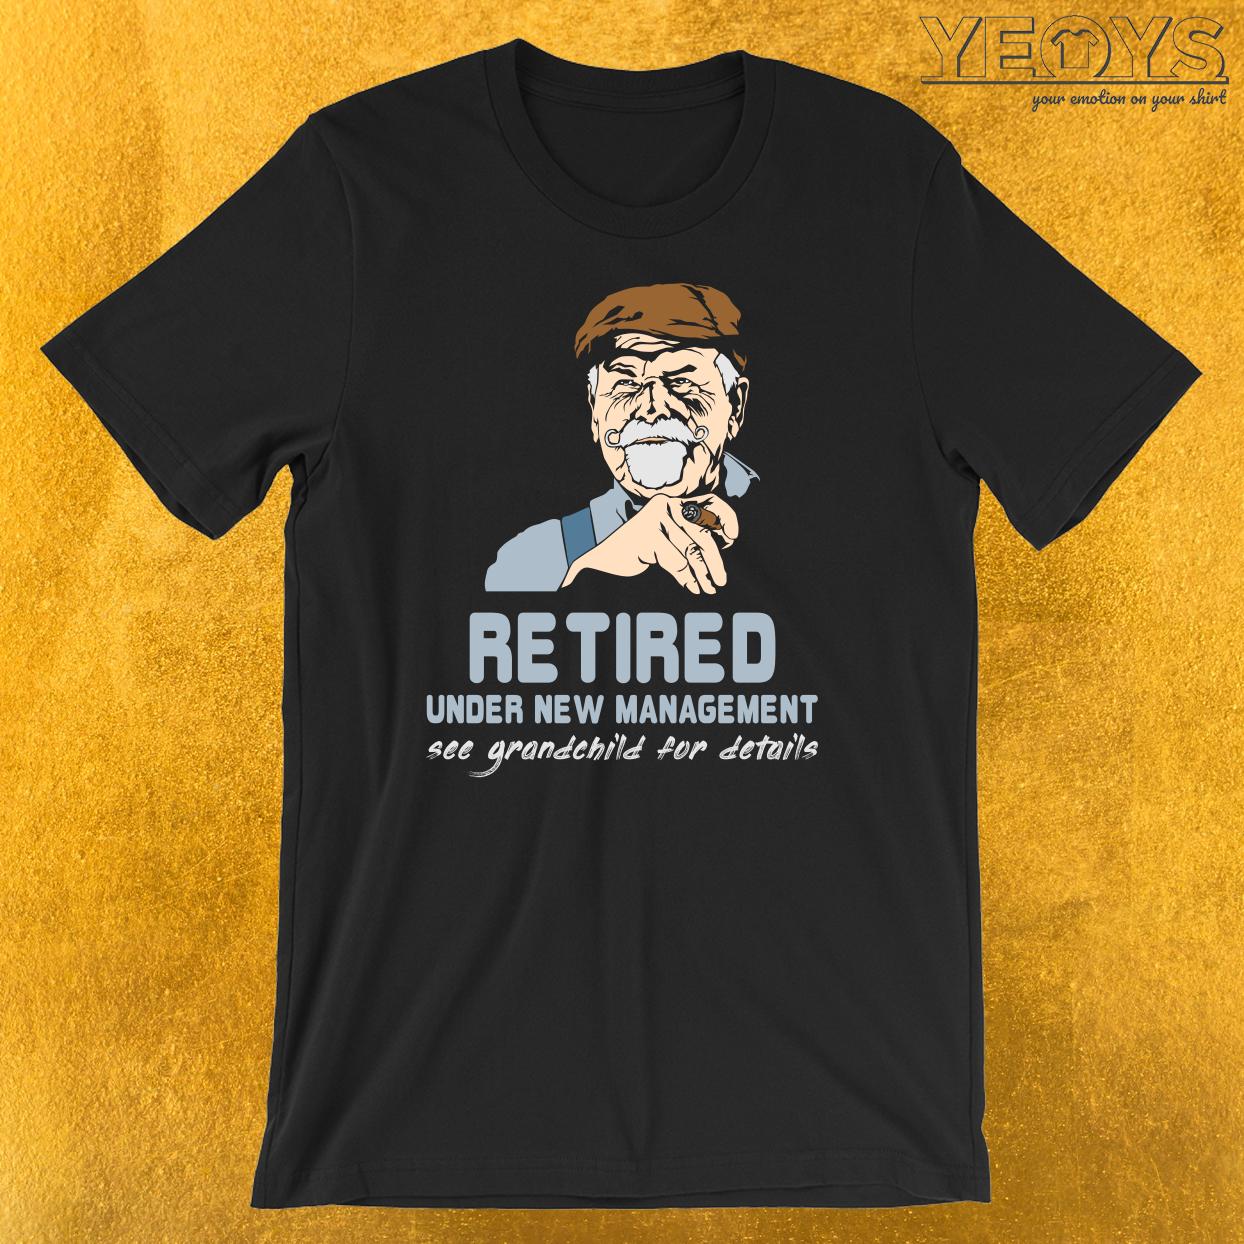 Retired Under New Management Grandchild T-Shirt